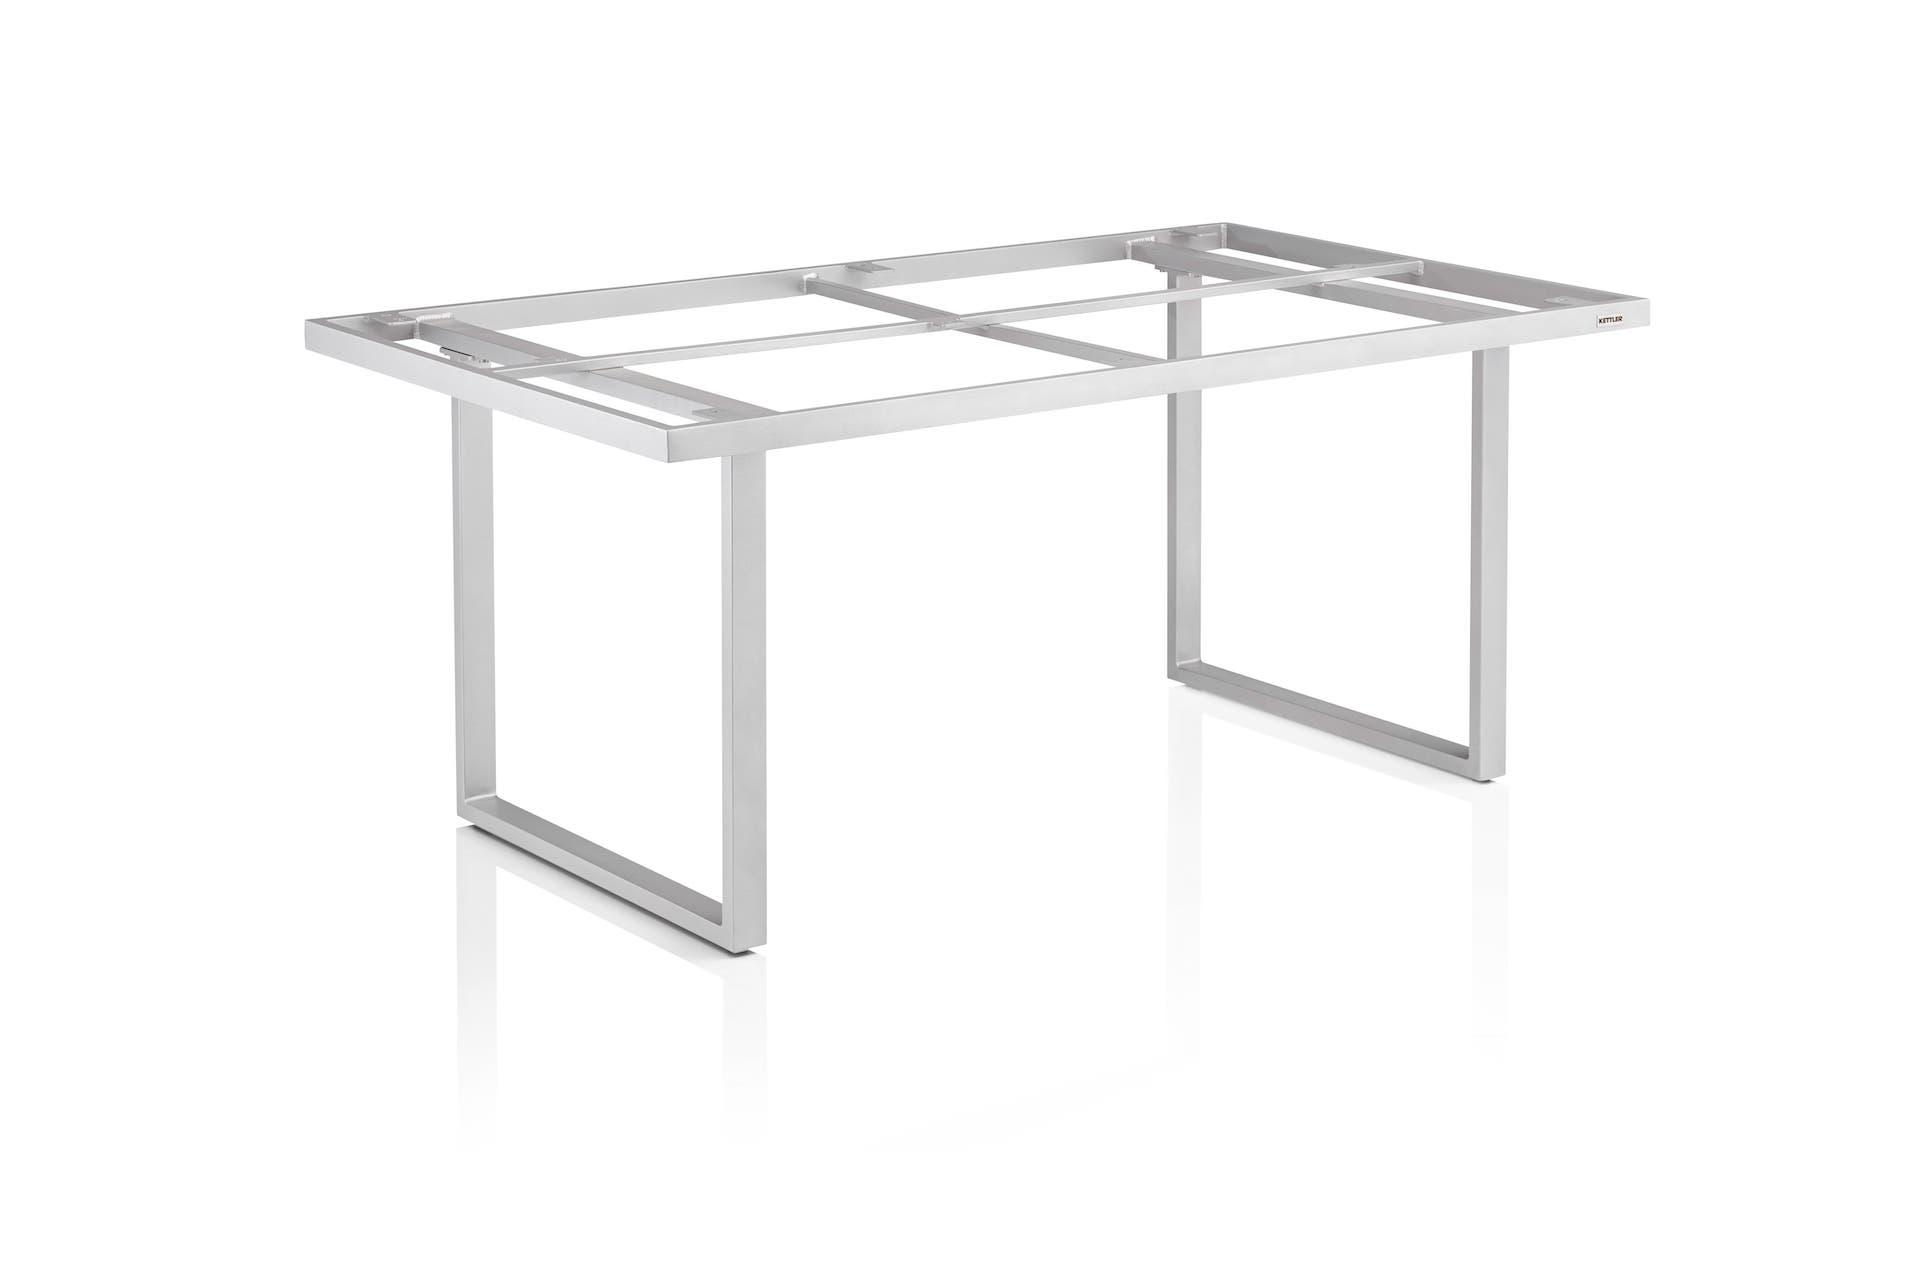 EGO MODULAR CASUAL DINING Skate Casual-Dining-Tischgestell